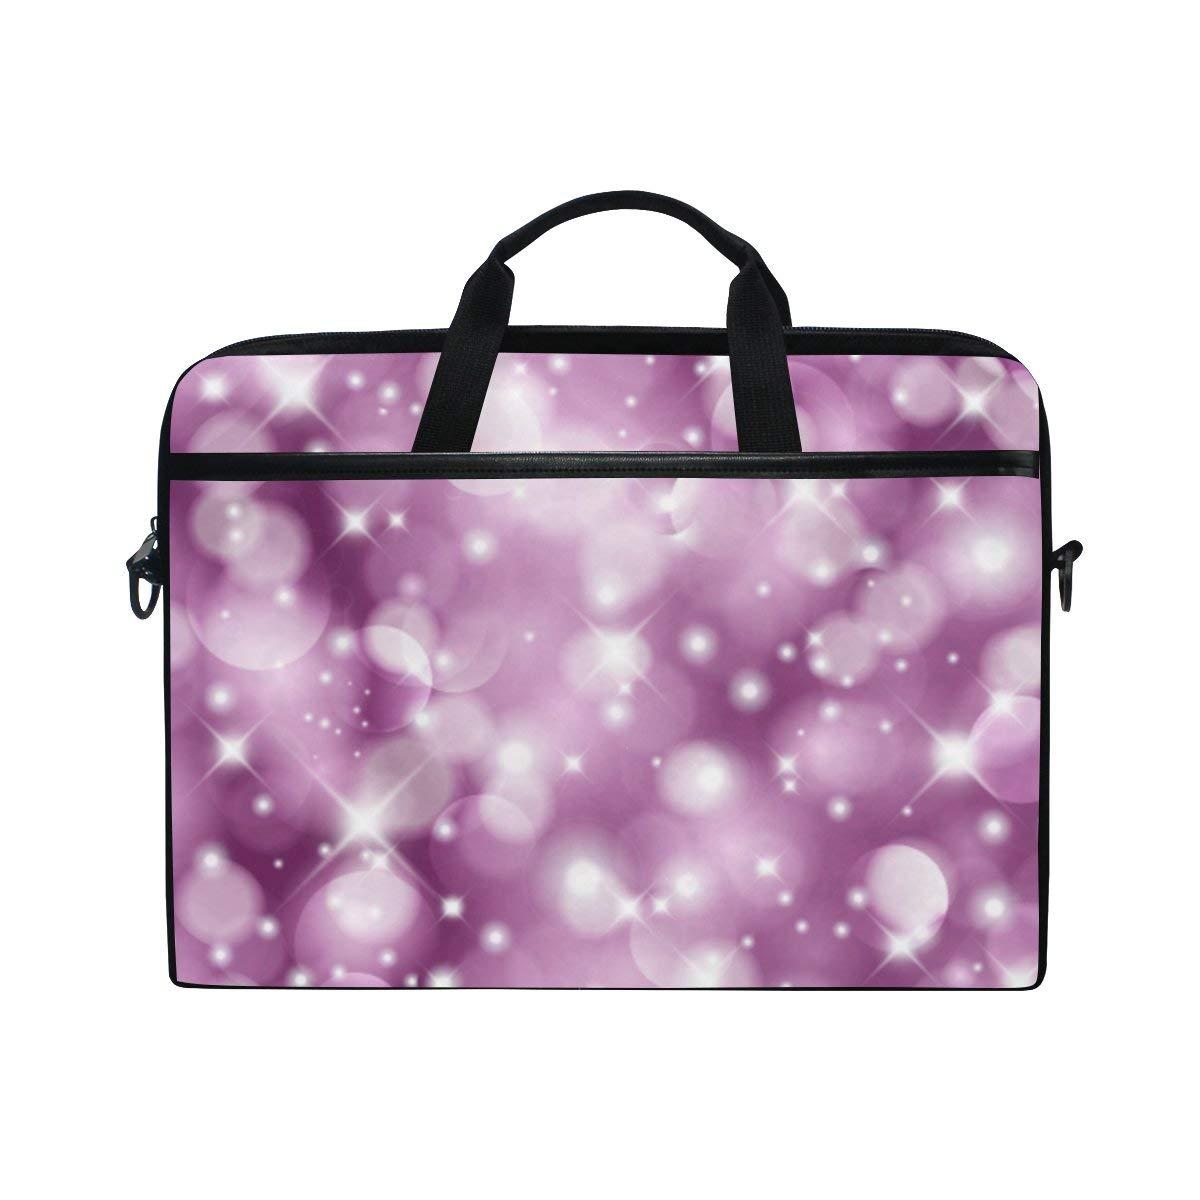 05e72d778f Get Quotations · ALAZA Purple Bling Laptop Bag Briefcase Shoulder Messenger  Bag for Men and Women Fits 15 15.6